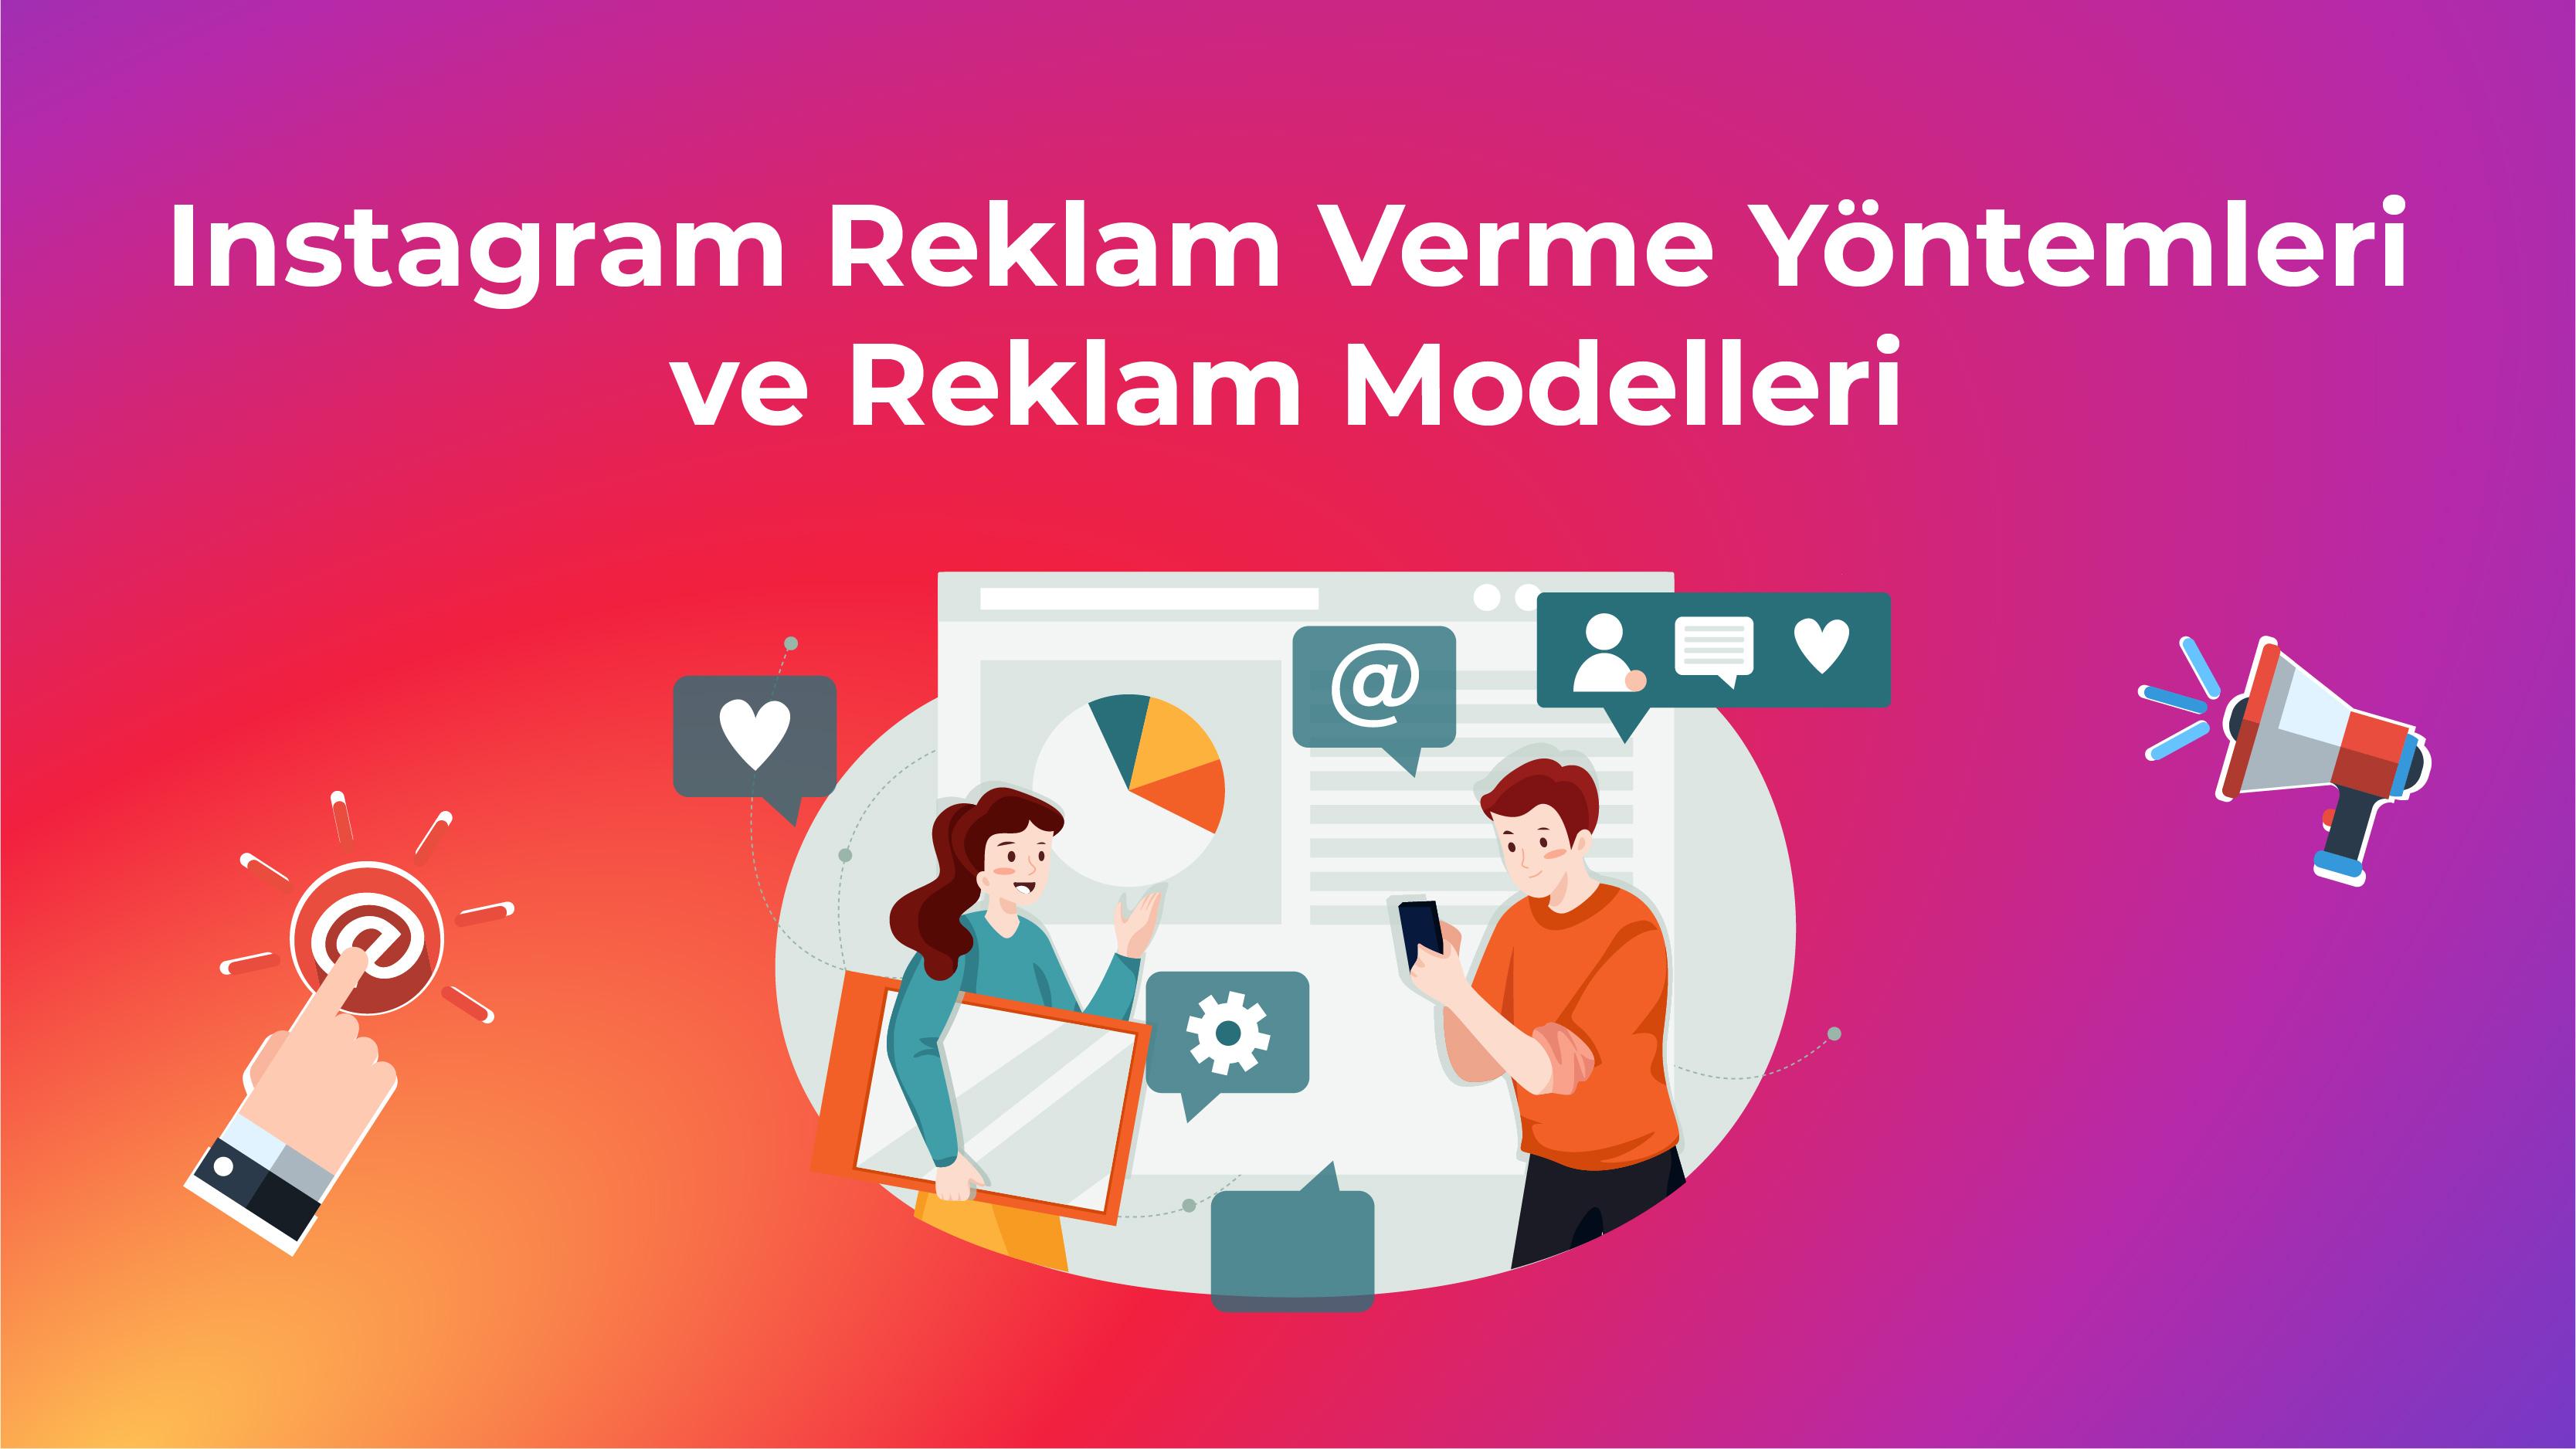 Instagram Reklam Verme Yöntemleri ve Reklam Modelleri